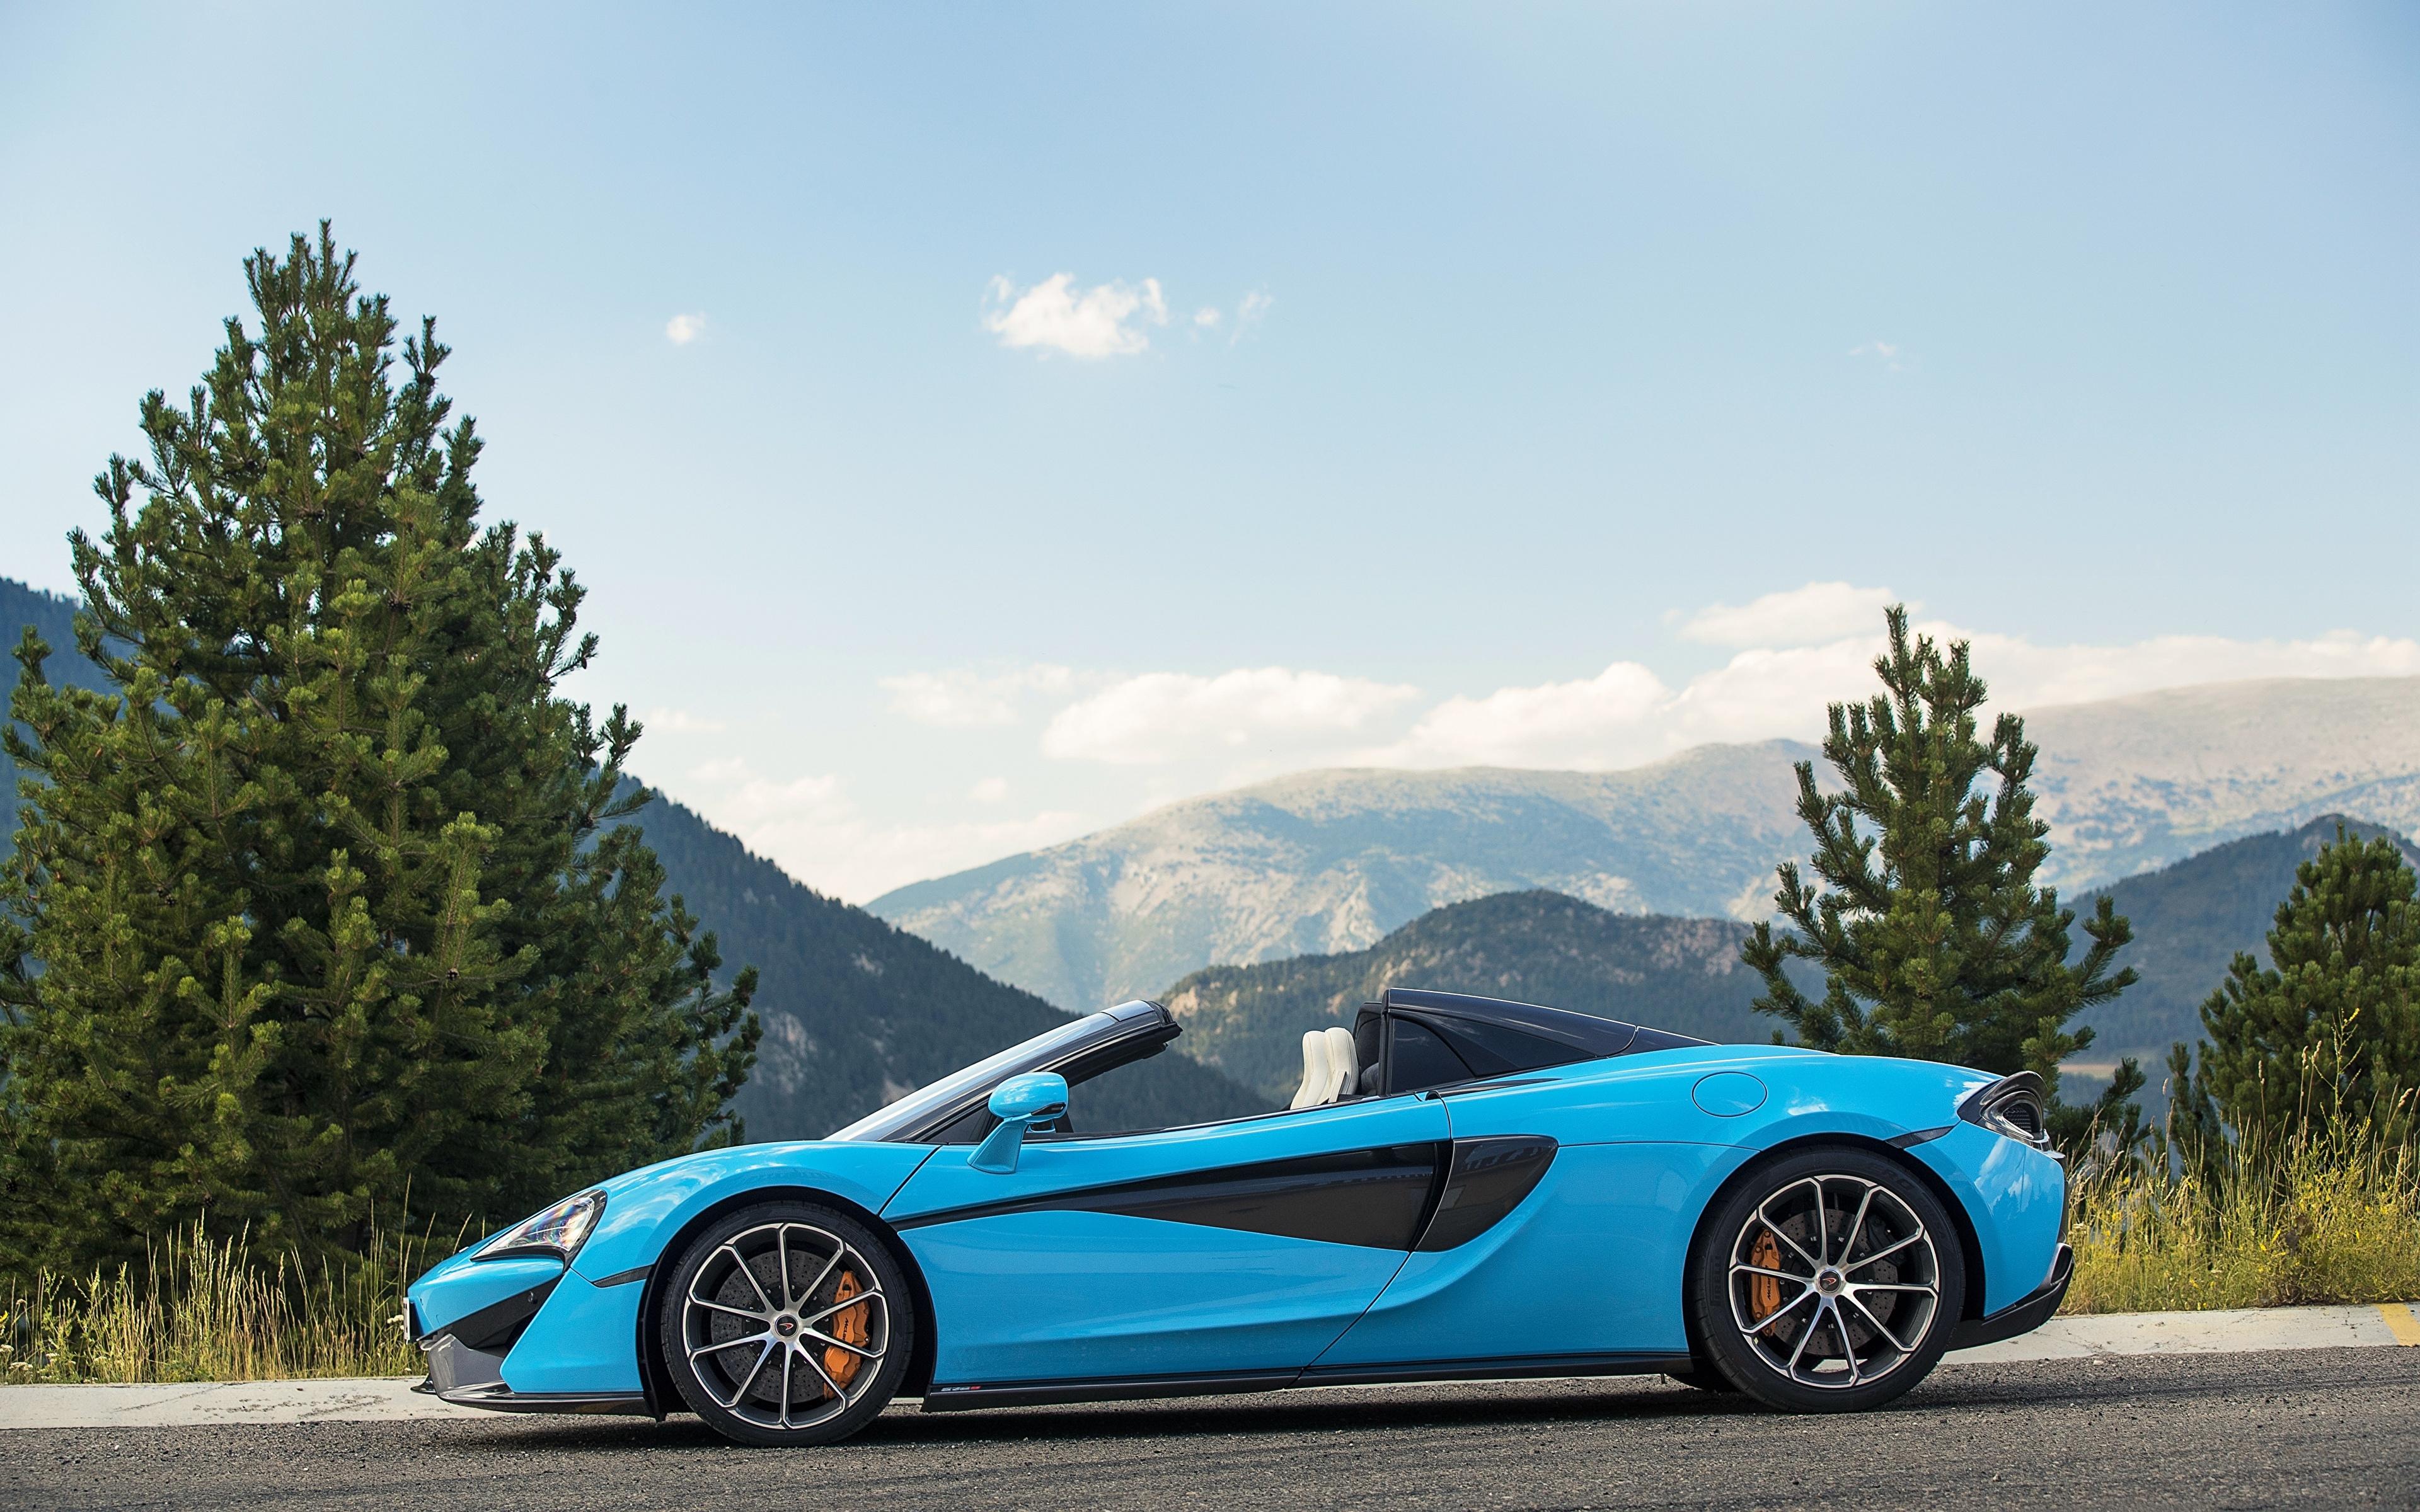 Картинка Макларен 2017 570S Spider Worldwide Родстер голубая Сбоку машины Металлик 3840x2400 McLaren голубых голубые Голубой авто машина автомобиль Автомобили